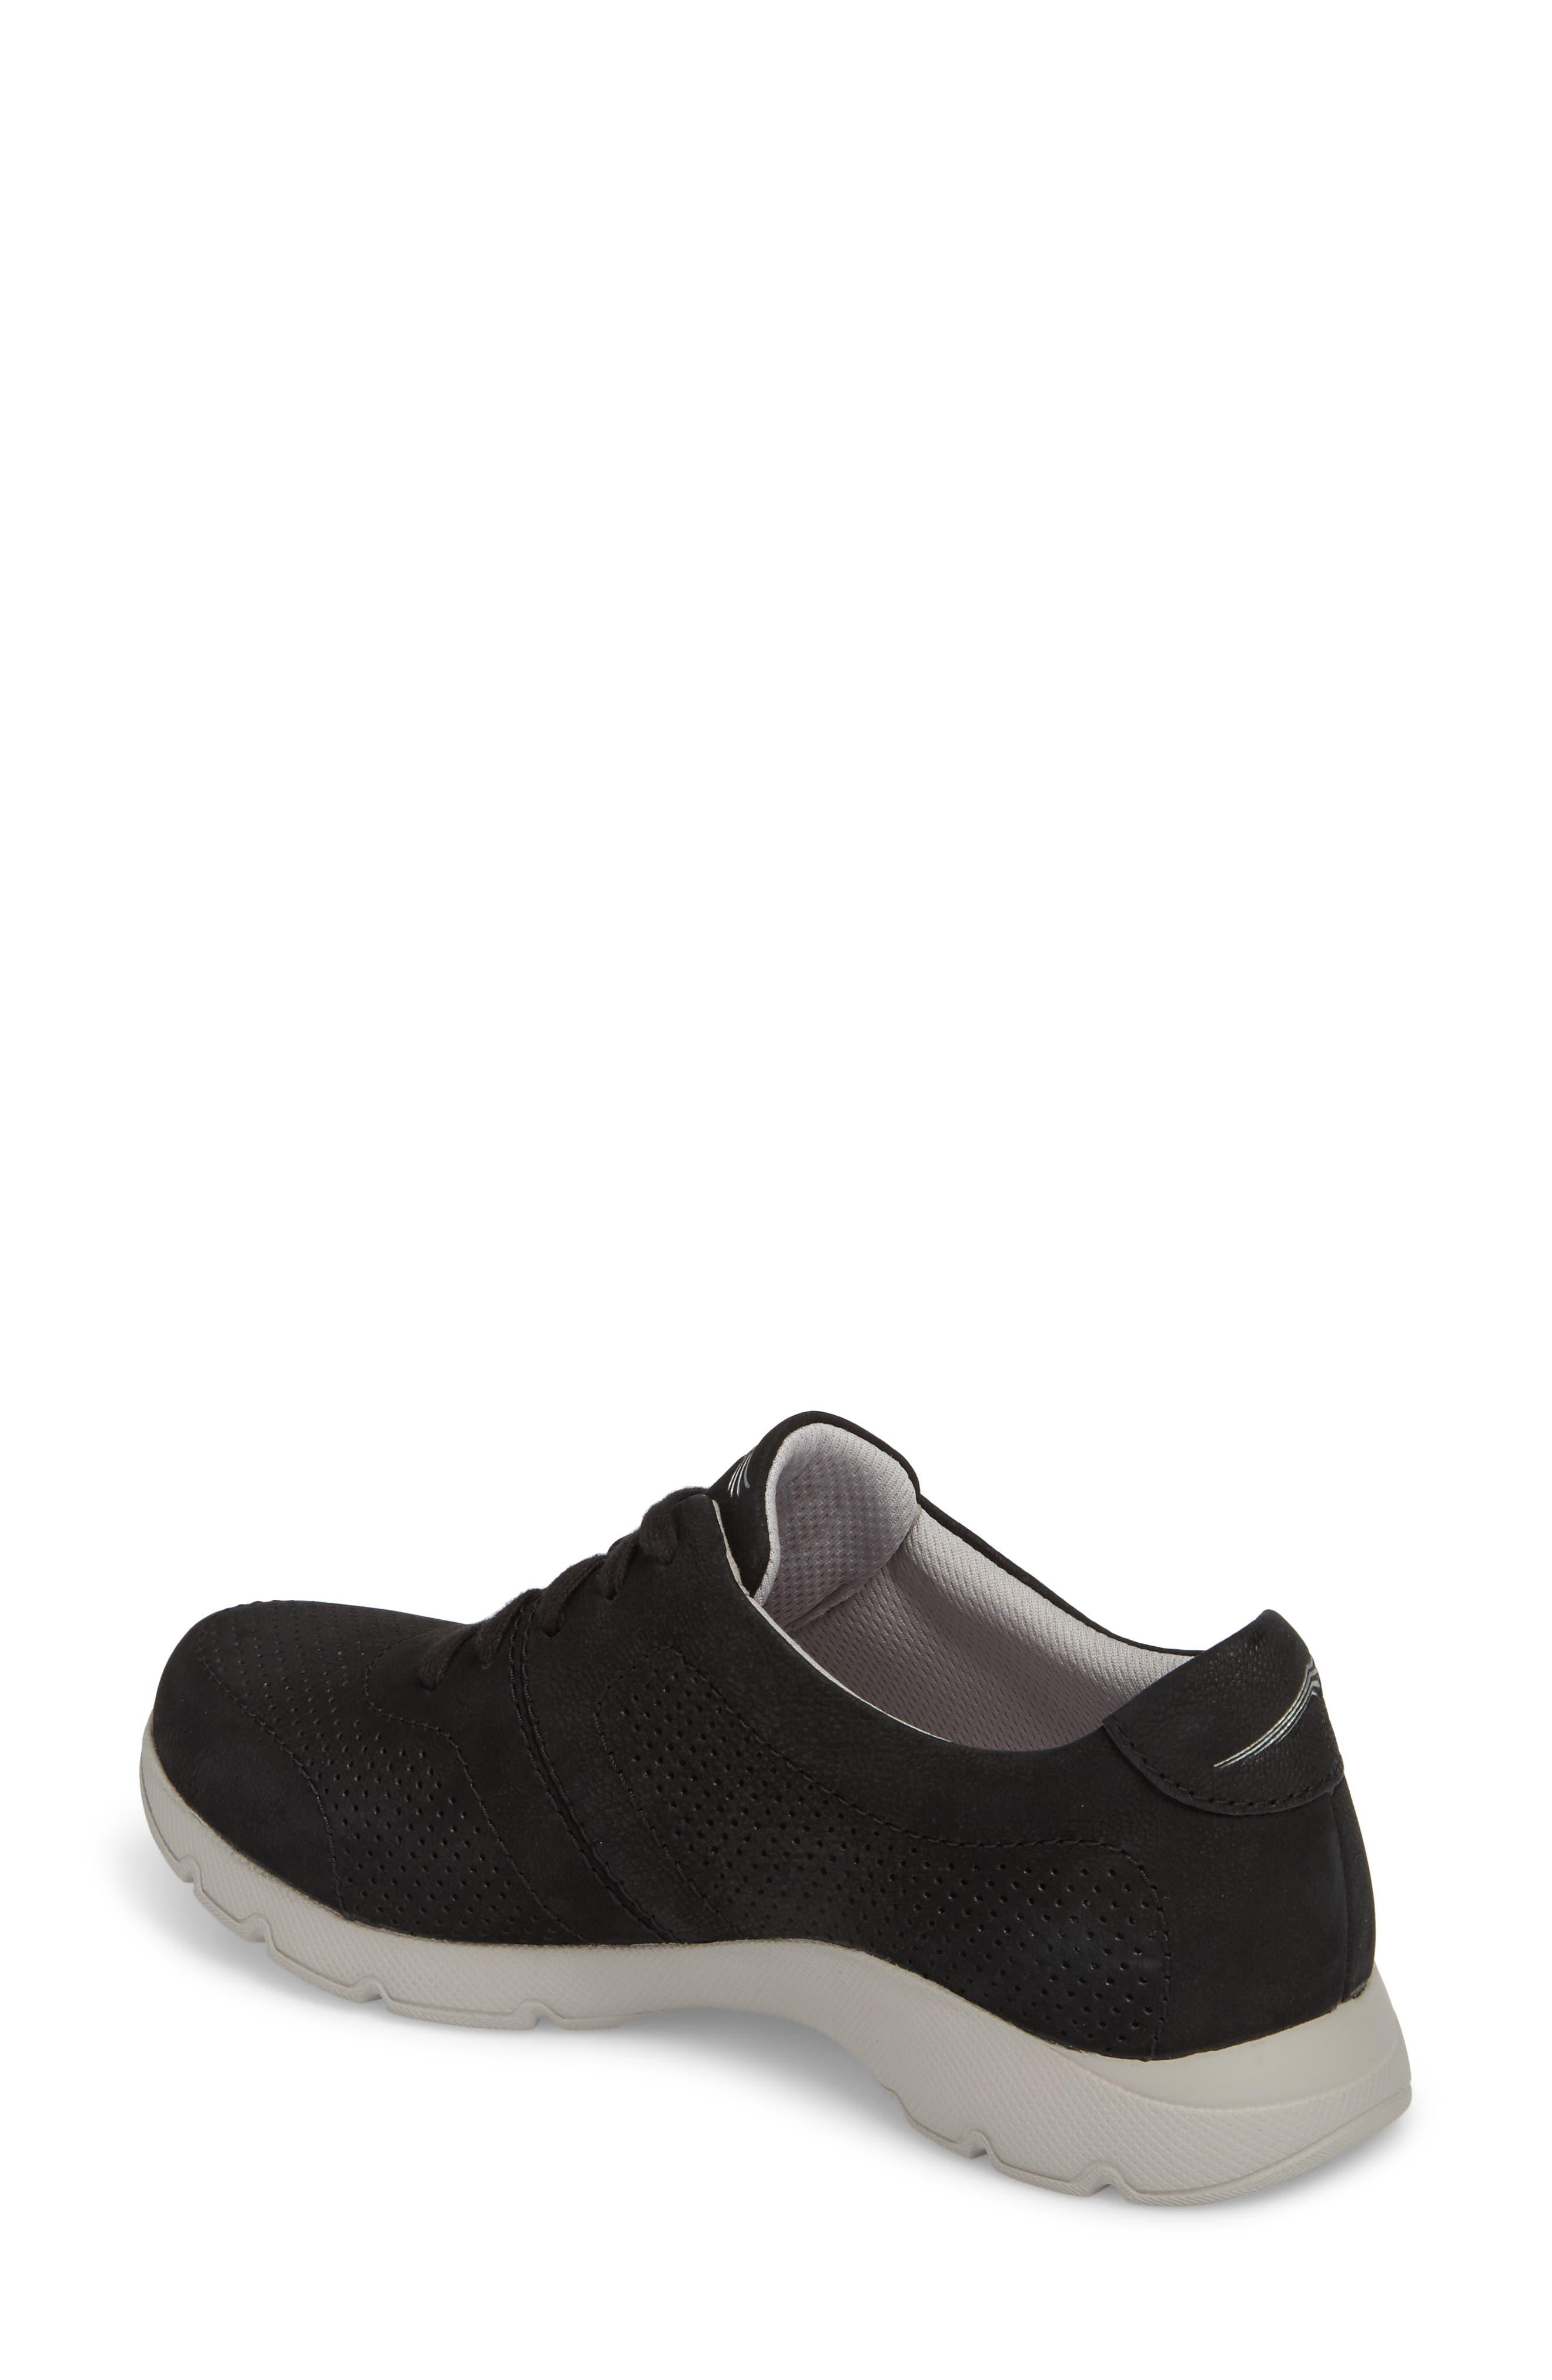 Alissa Sneaker,                             Alternate thumbnail 2, color,                             BLACK MILLED NUBUCK LEATHER